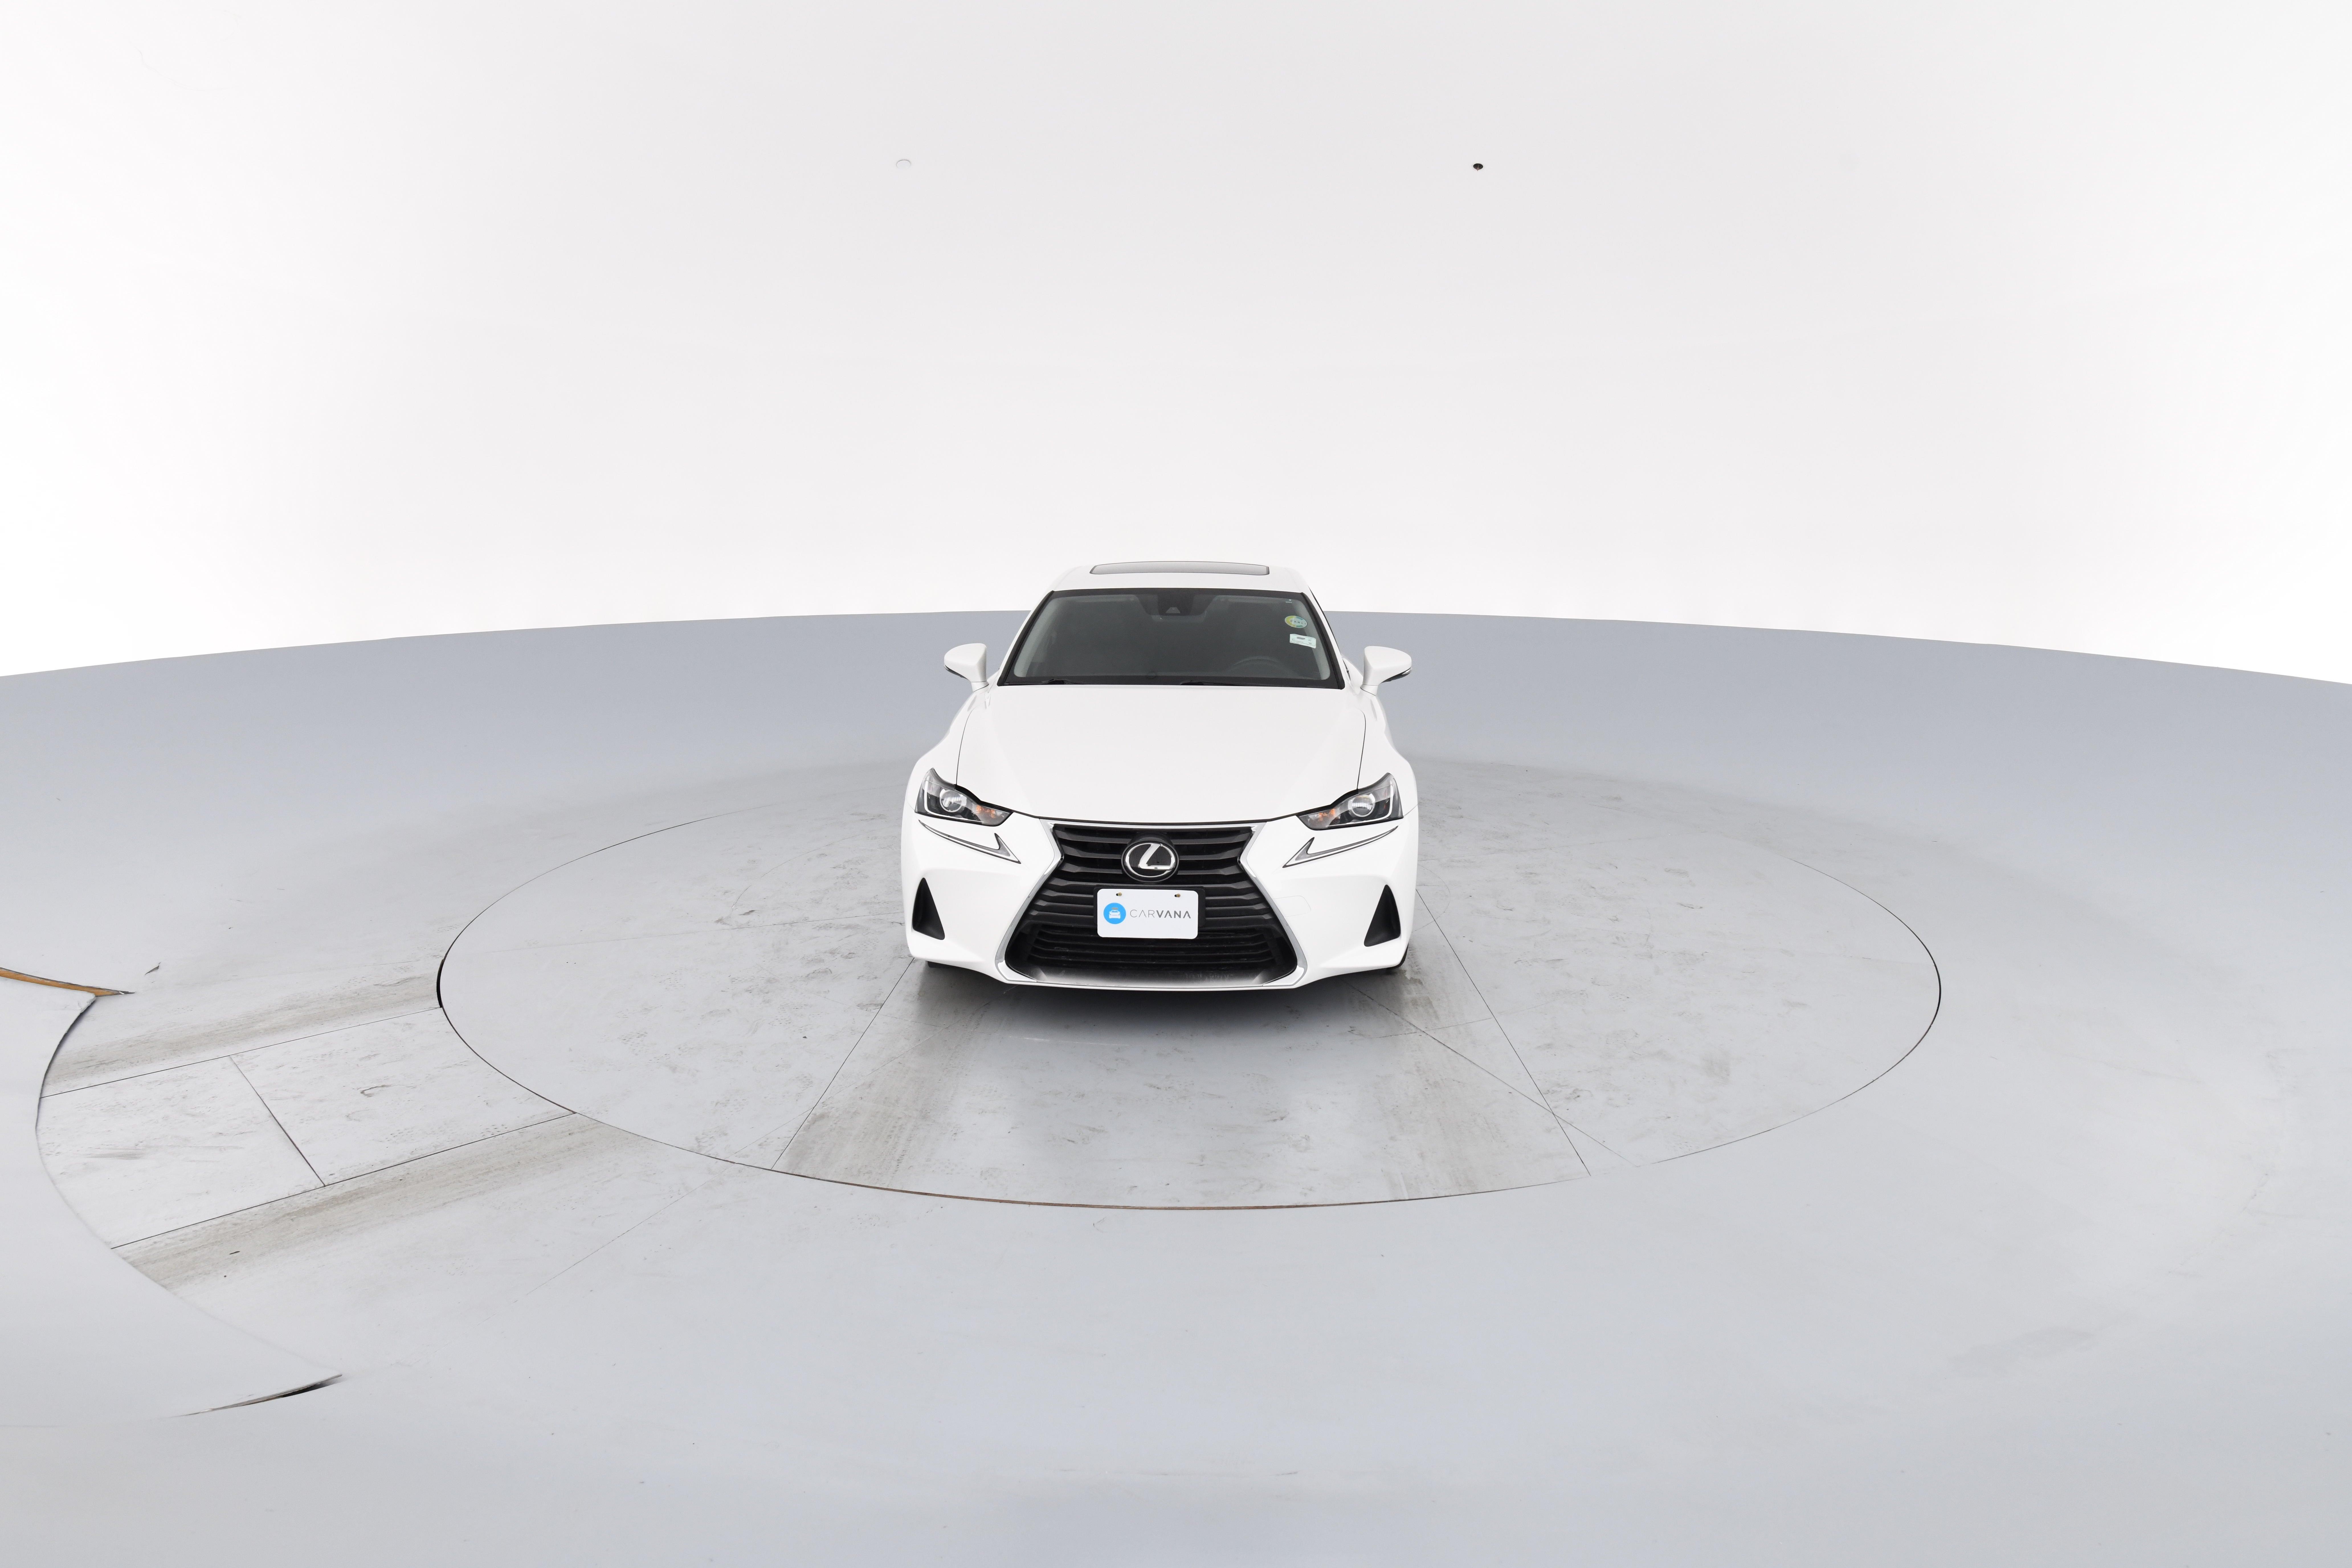 2019 Lexus IS 300 Hayward CA